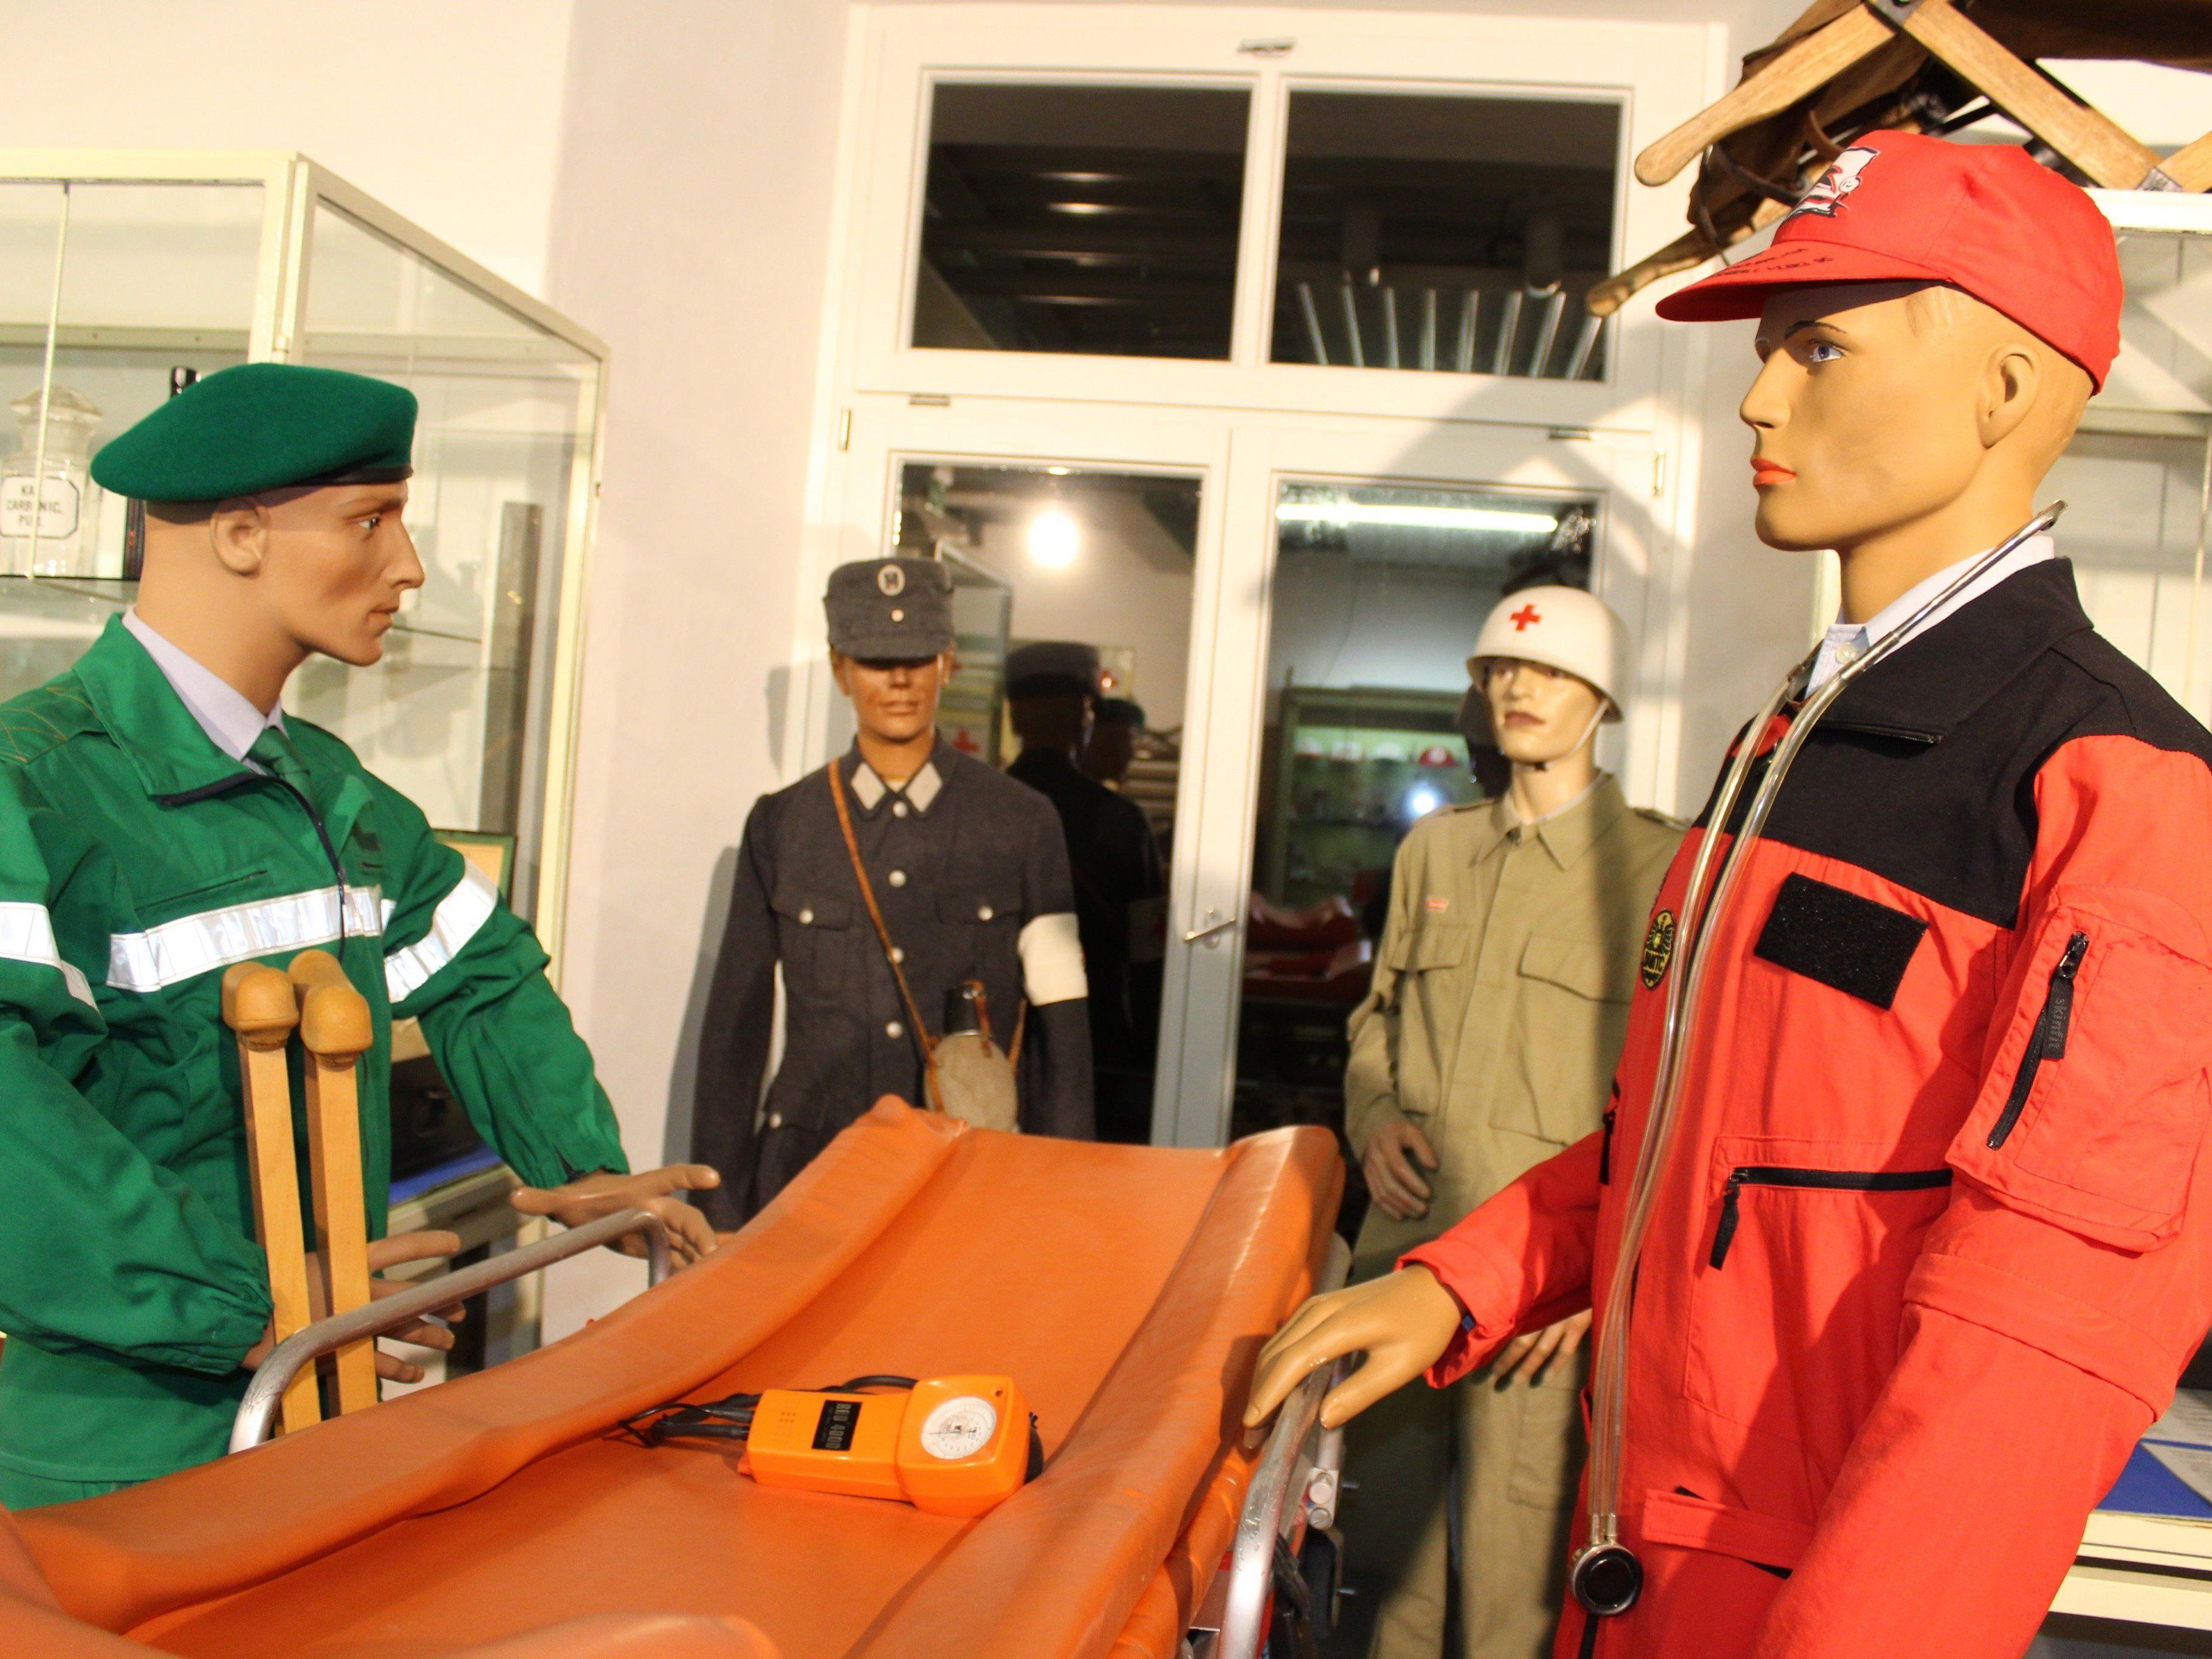 Neues Rettungsmuseum in der Museumswelt eröffnet